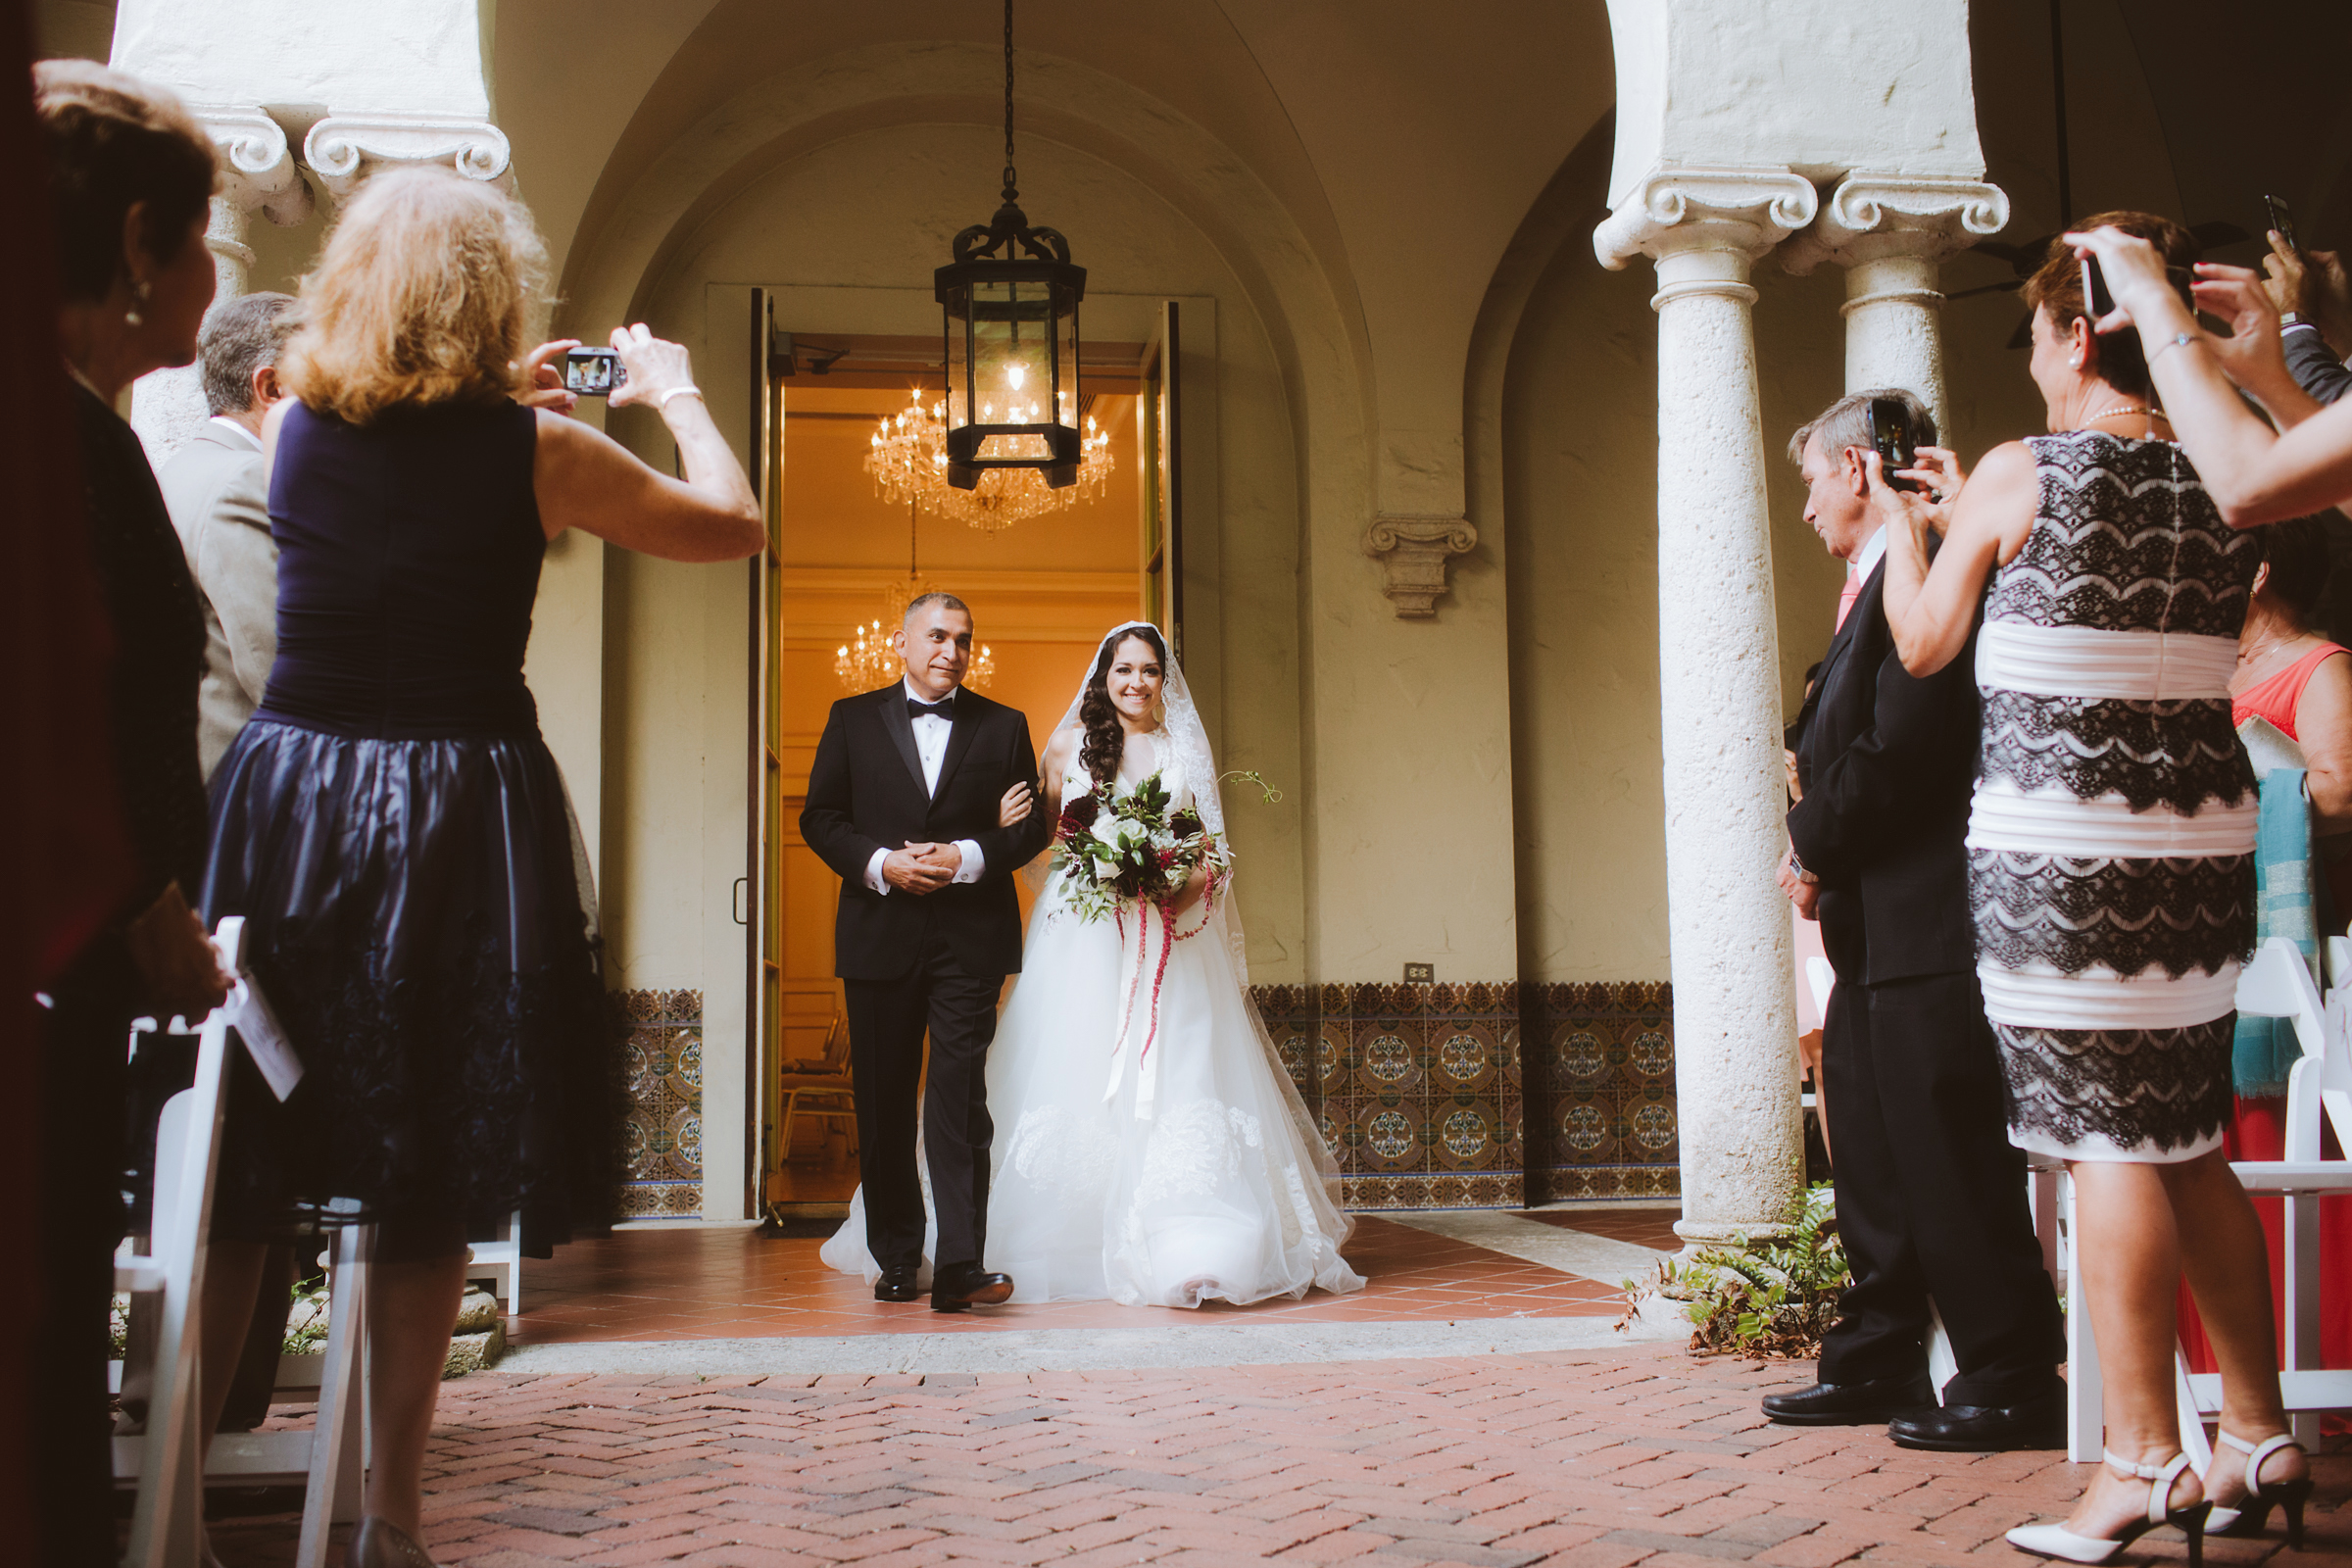 wedding day | MFA St Pete | Vanessa Boy Photography | vanessaboy.com-325.com |final.jpg